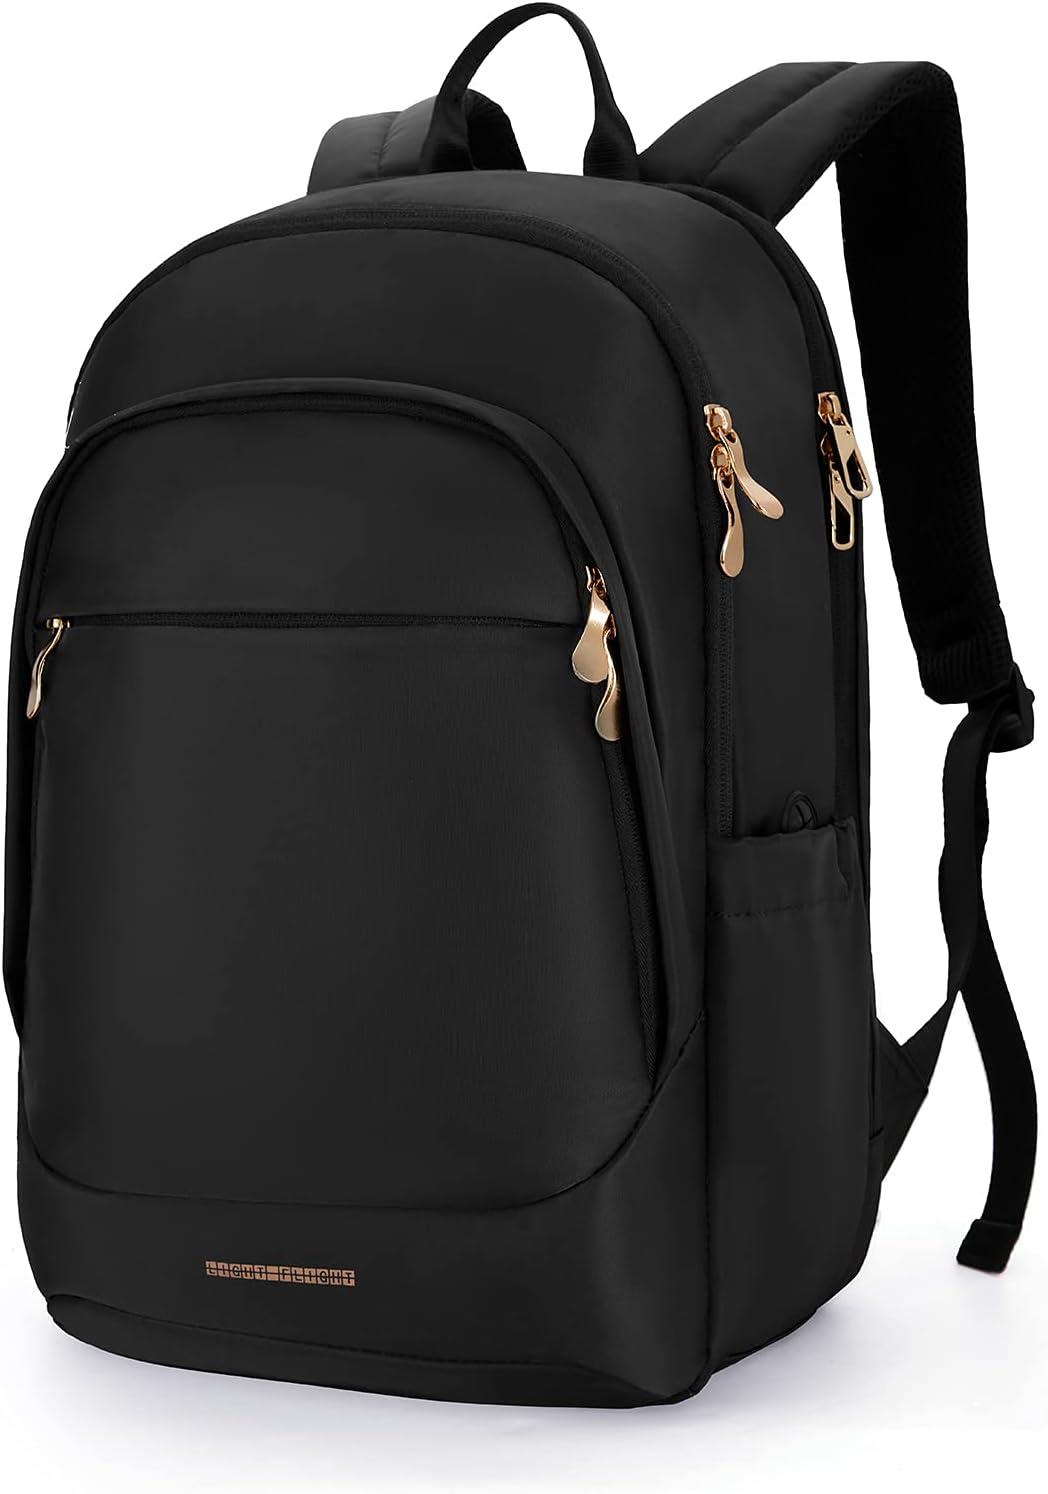 Laptop Backpack LIGHT FLIGHT Women Backpacks Travel School College 15.6 inches Laptop Bags for Work Black